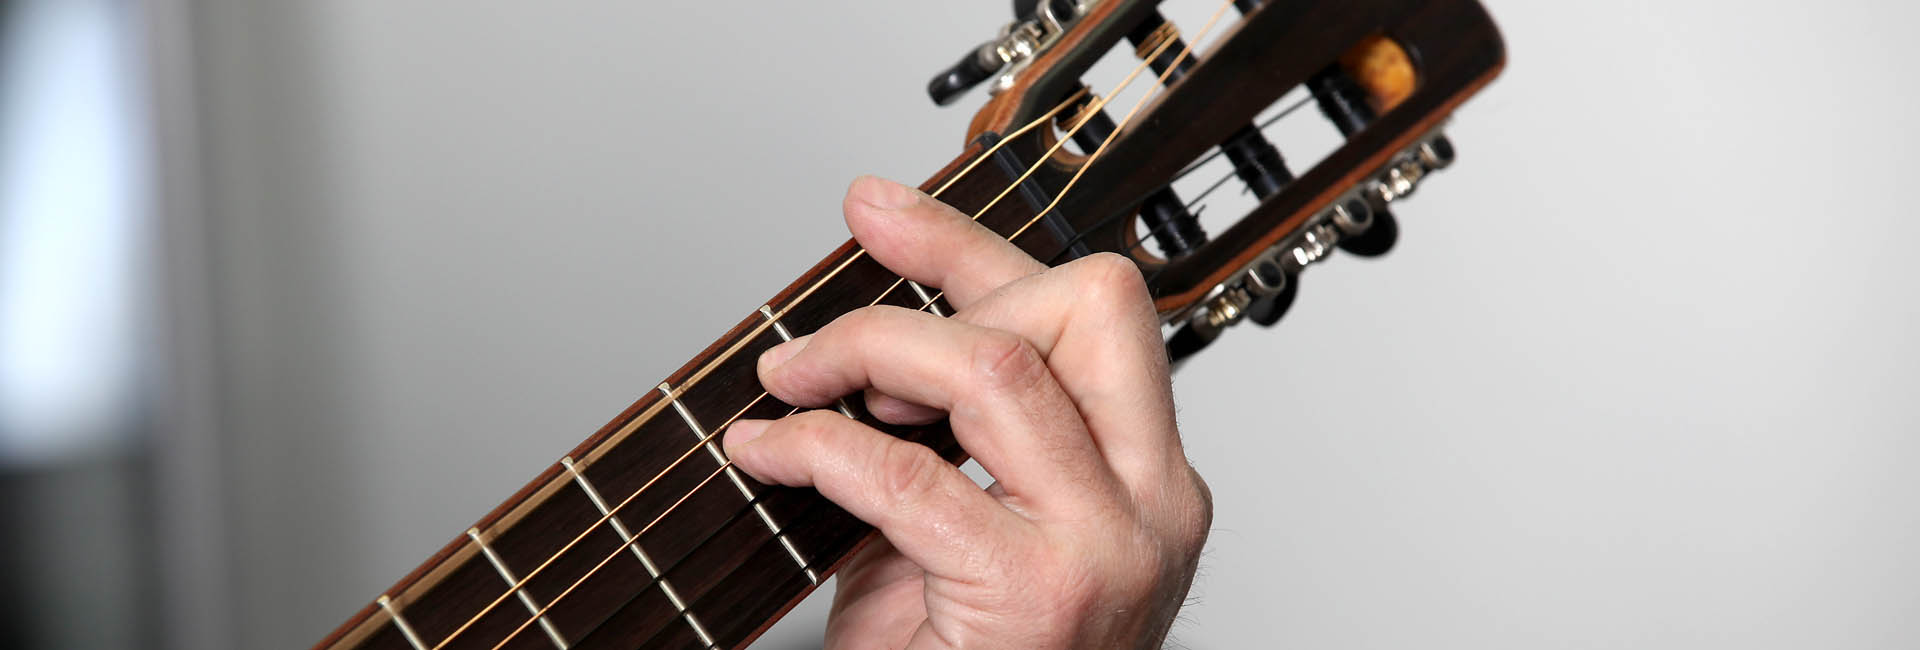 Private Musikschule Musikunterricht